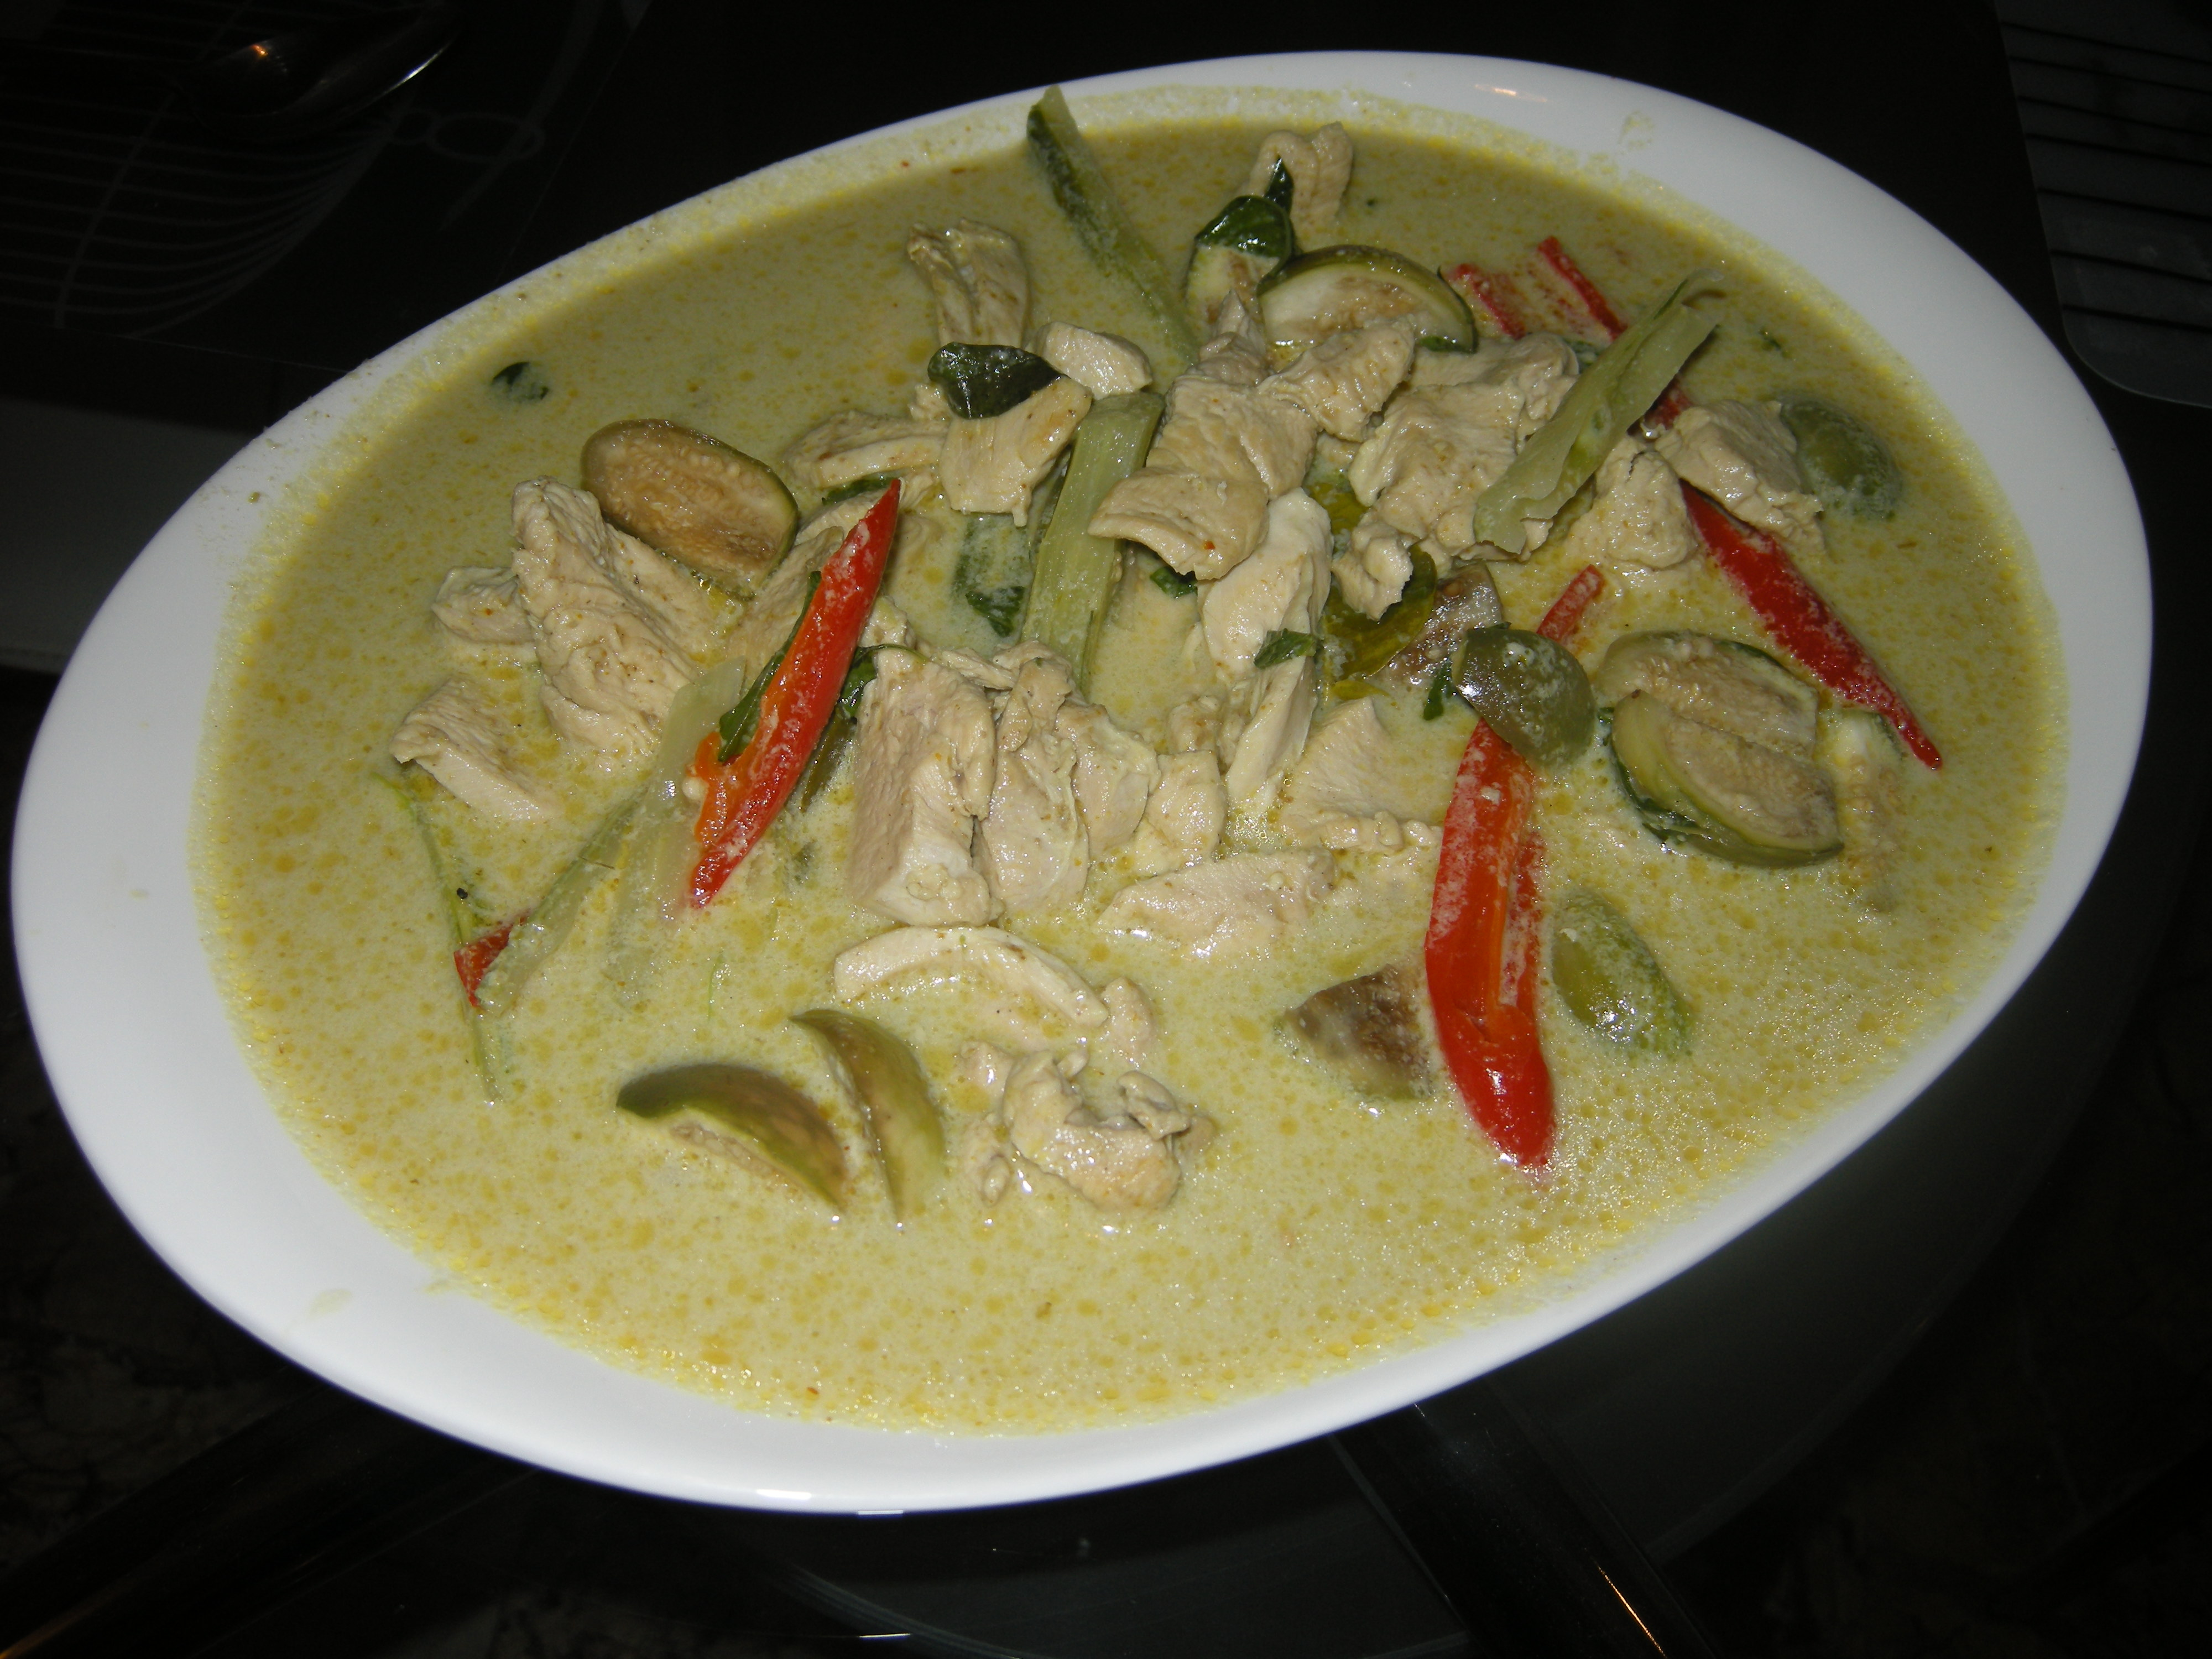 Curry vert au poulet gaeng kiew wan gai cuisine tha landaise - Cuisine thai poulet curry vert ...